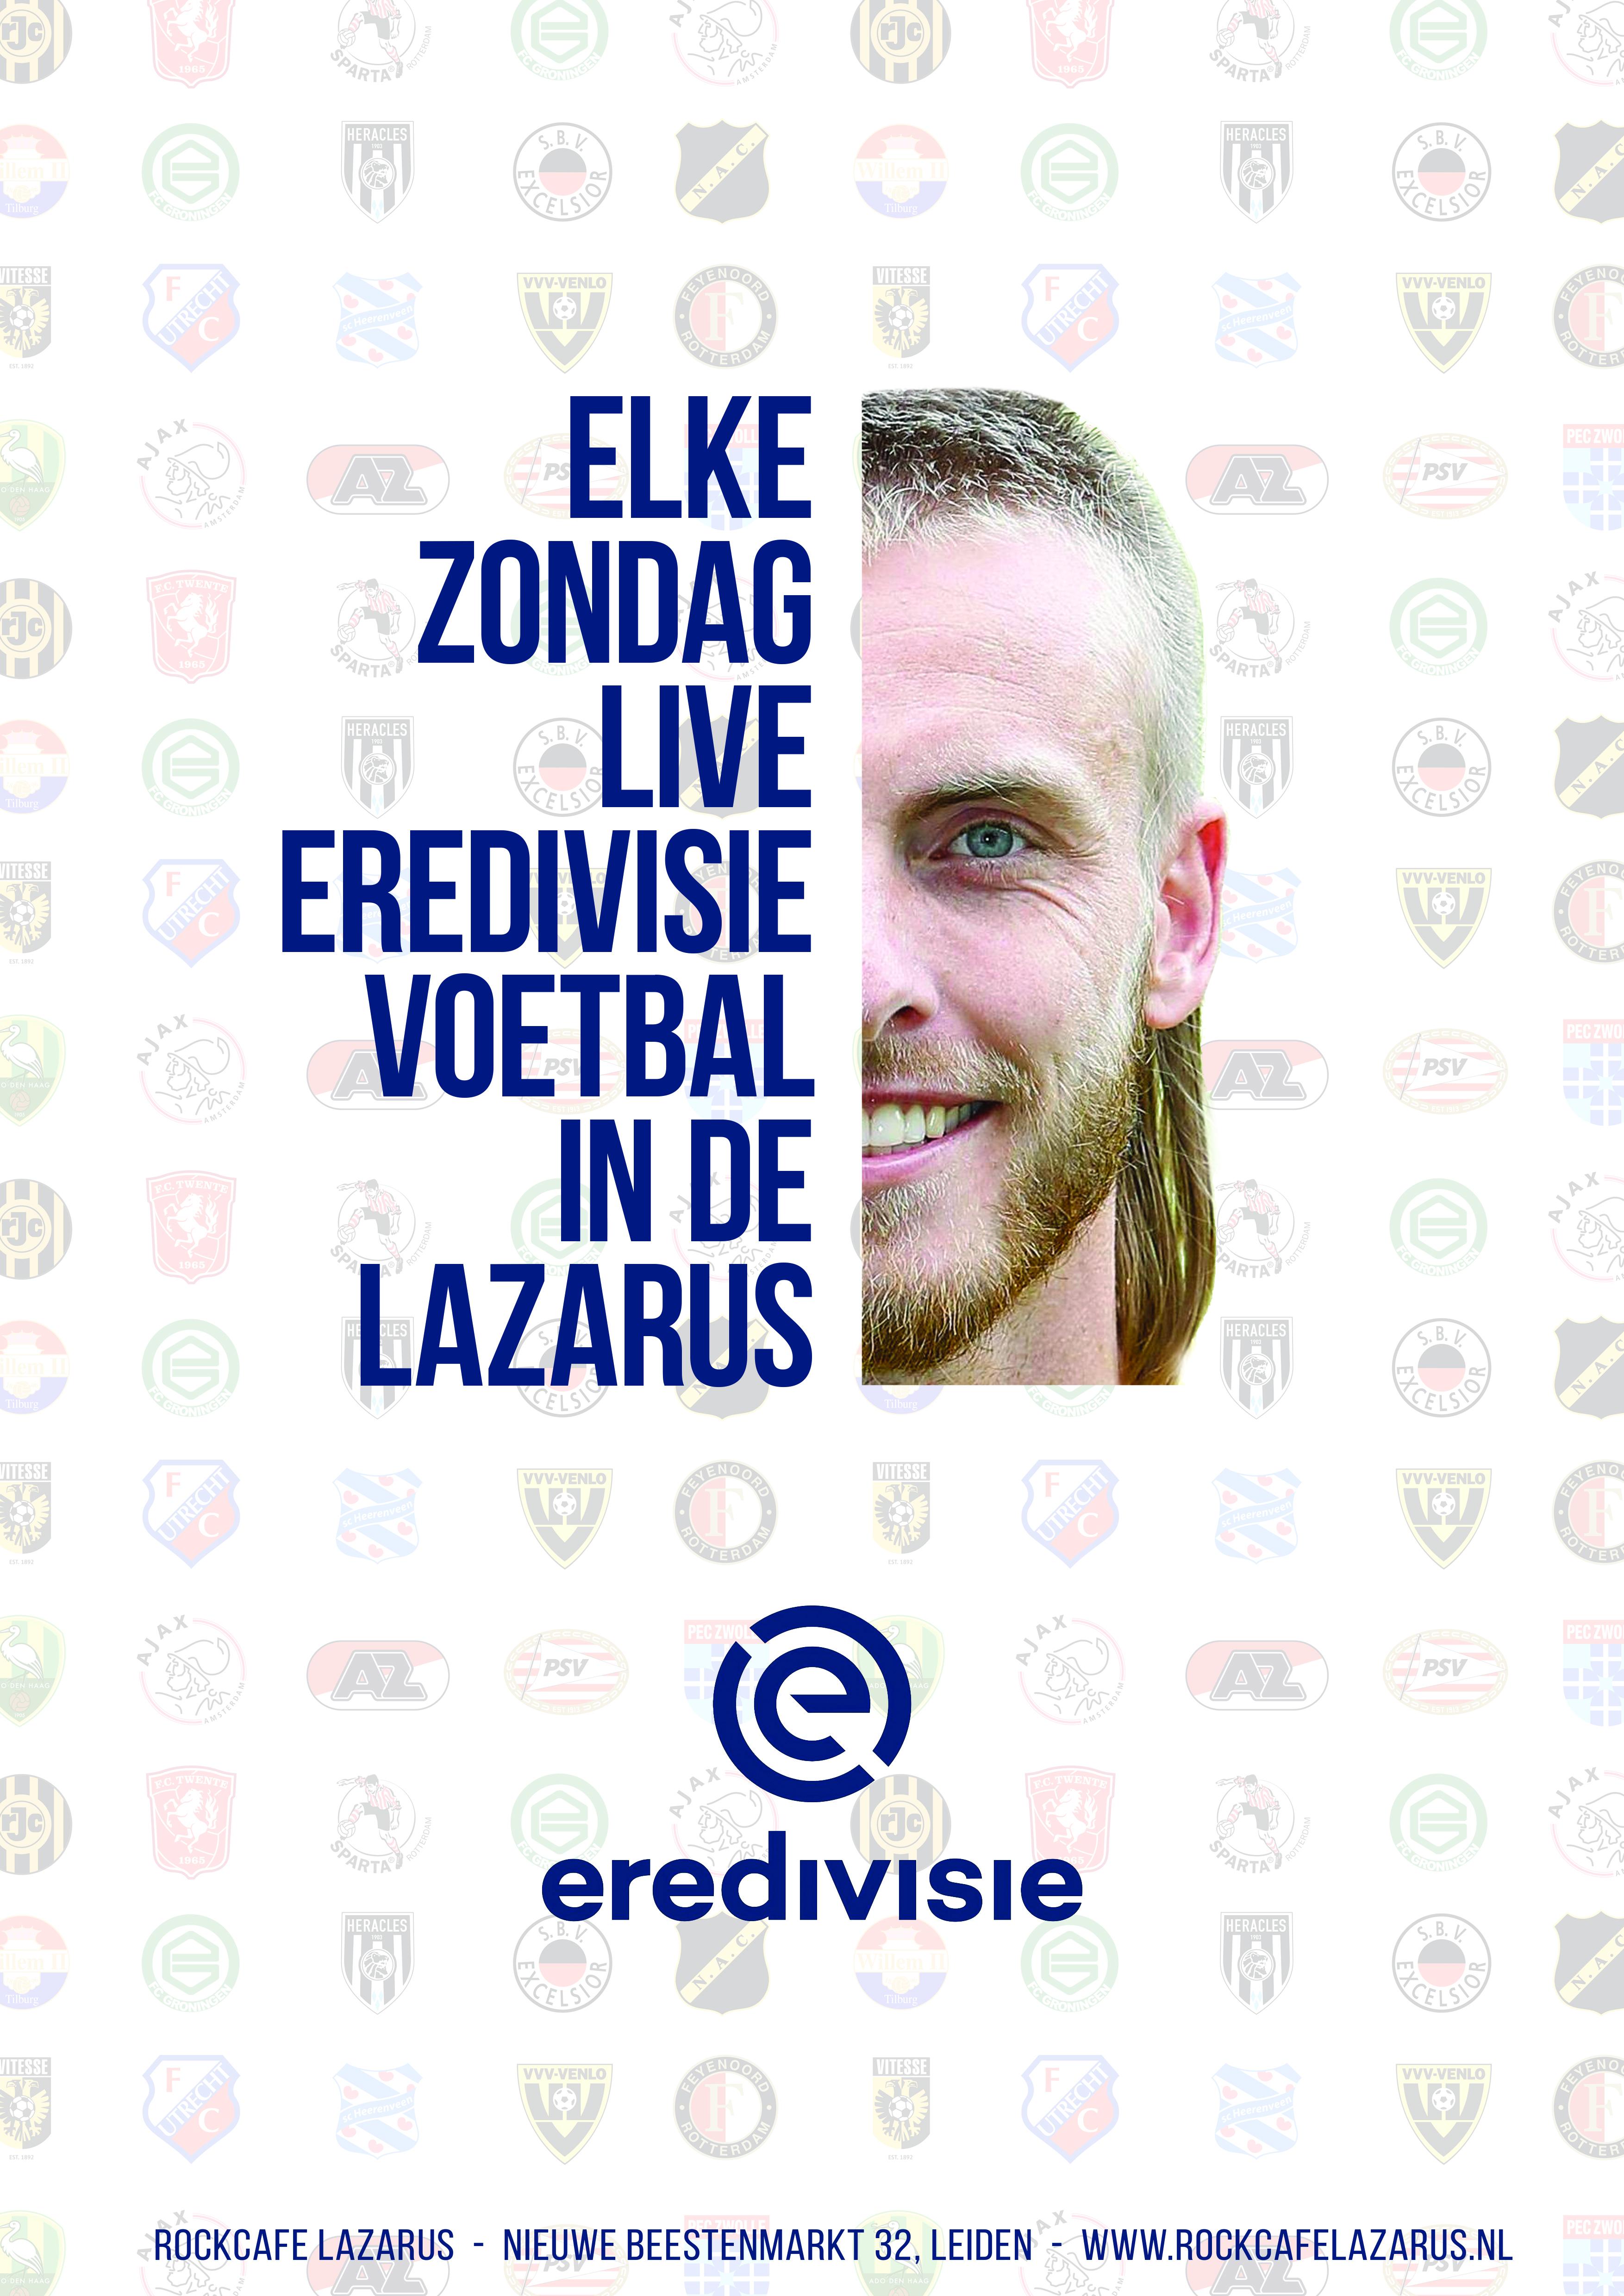 Eredivisie in de Lazaru's